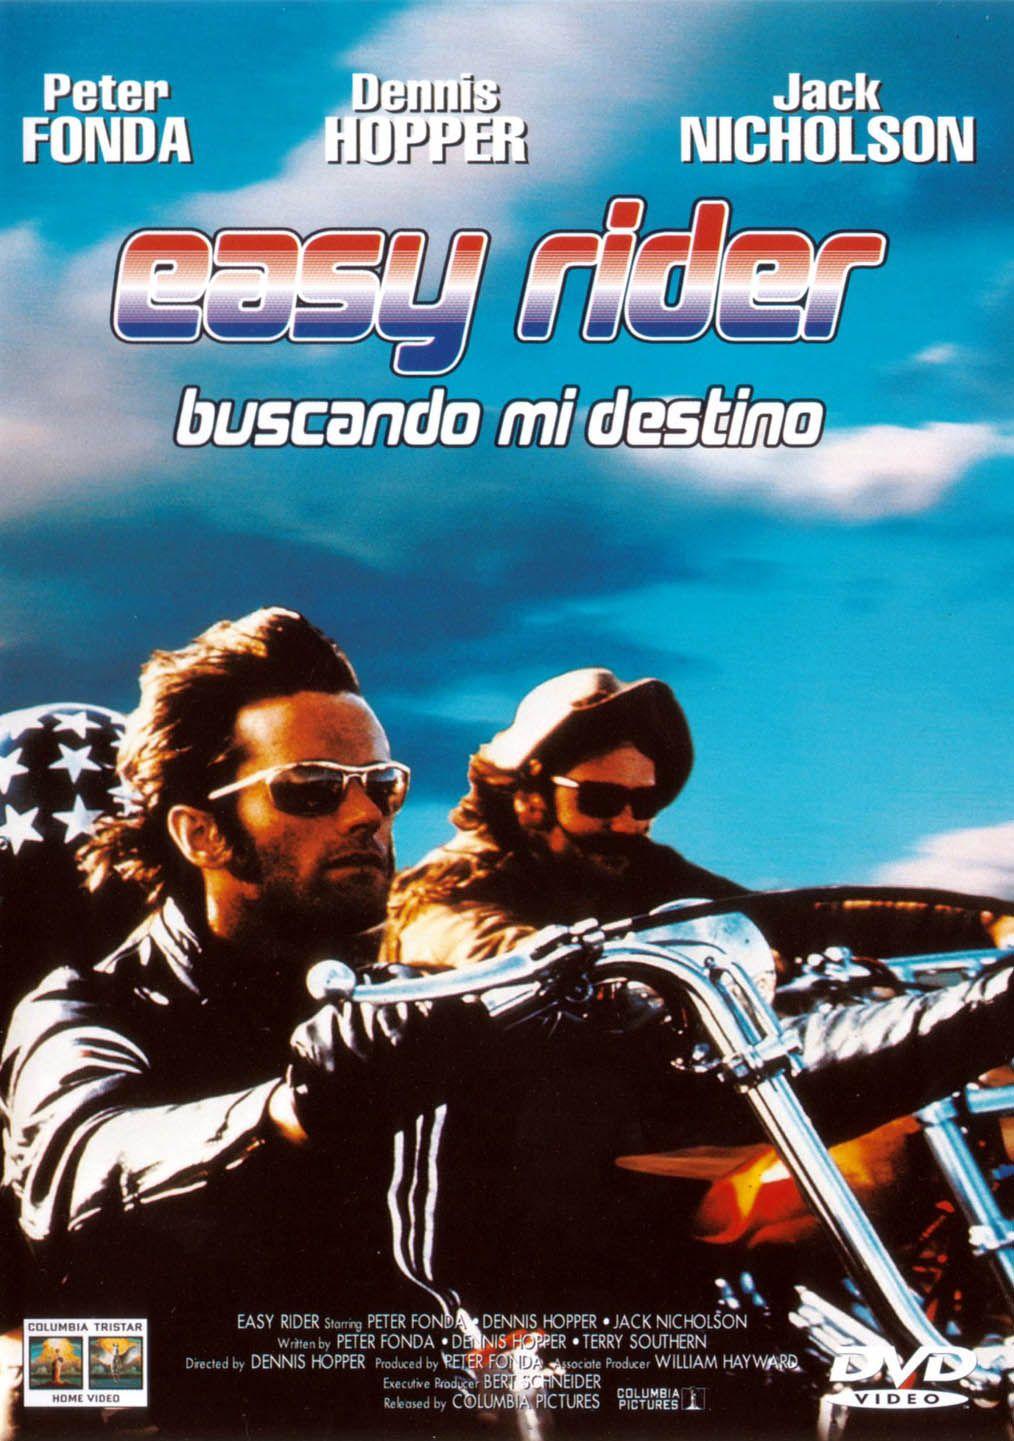 Easy Rider Buscando Mi Destino 1969 Eeuu Dir Dennis Hopper Drama Road Movie Cine Independente Pe Peliculas De Culto Carteles De Cine Busco Mi Destino